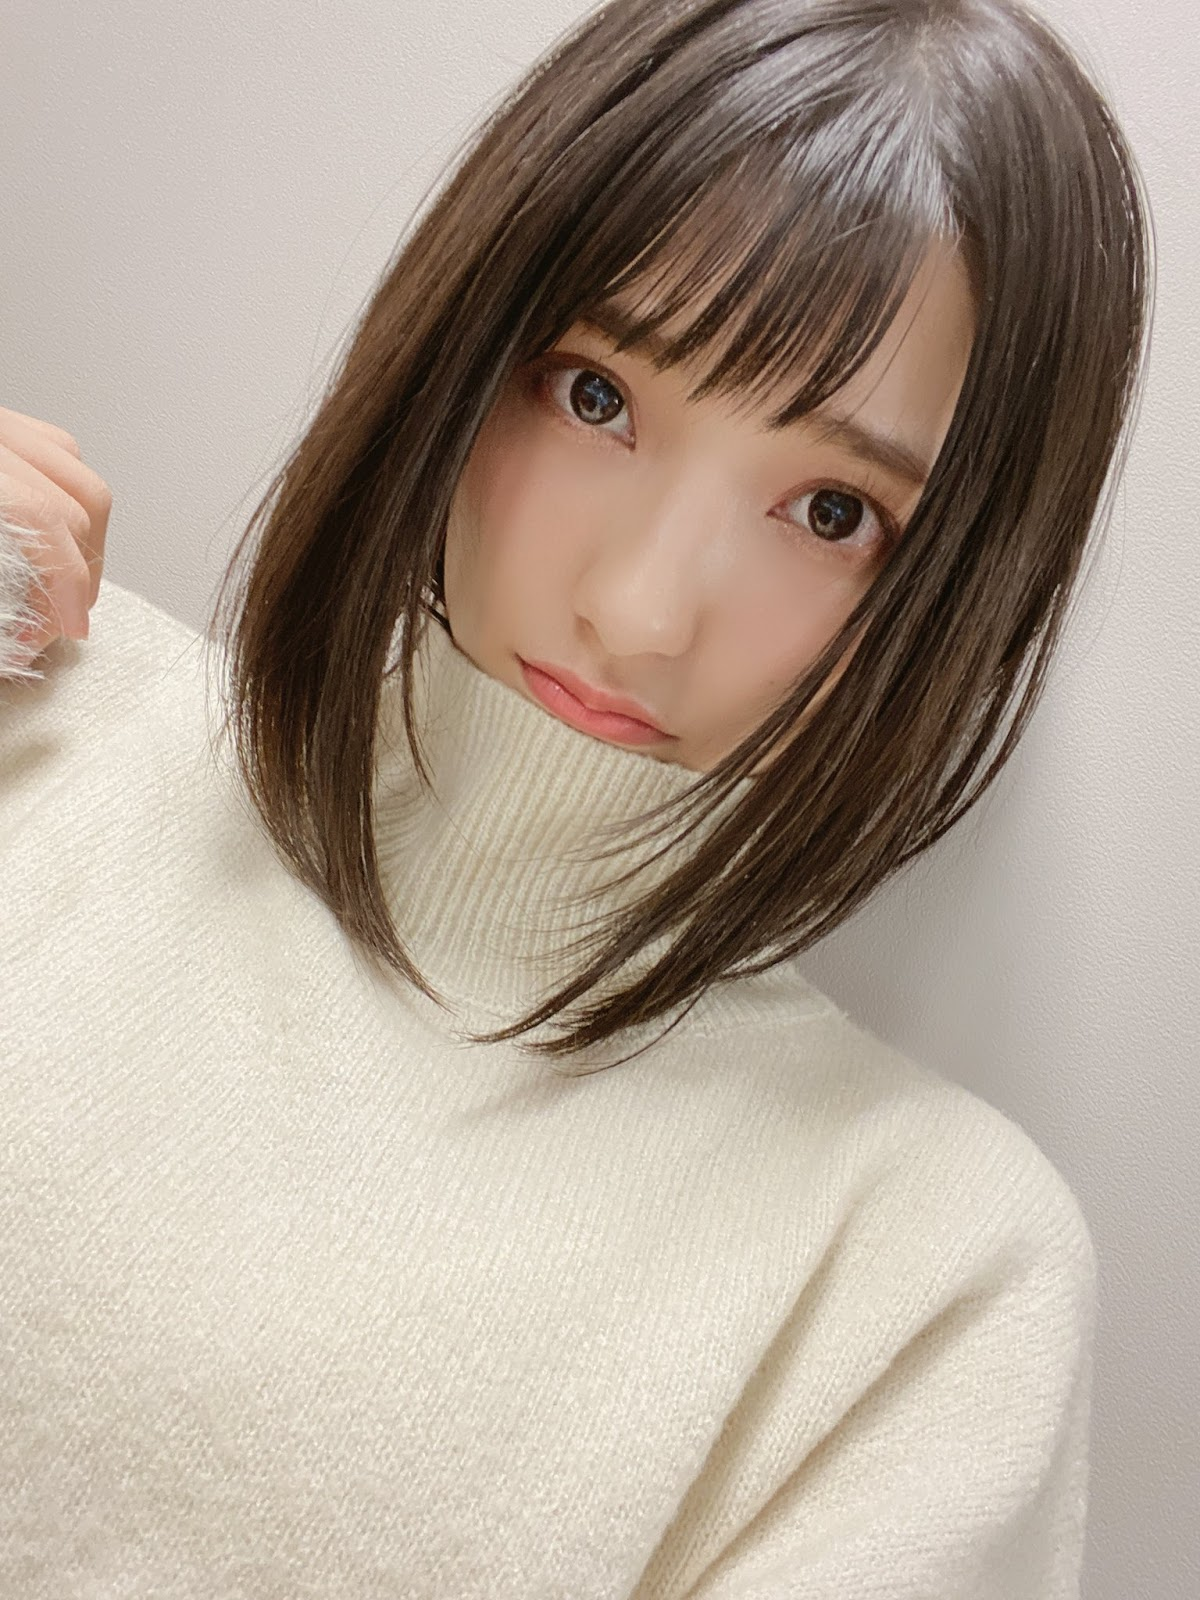 Marika Kouno (高野麻里佳)